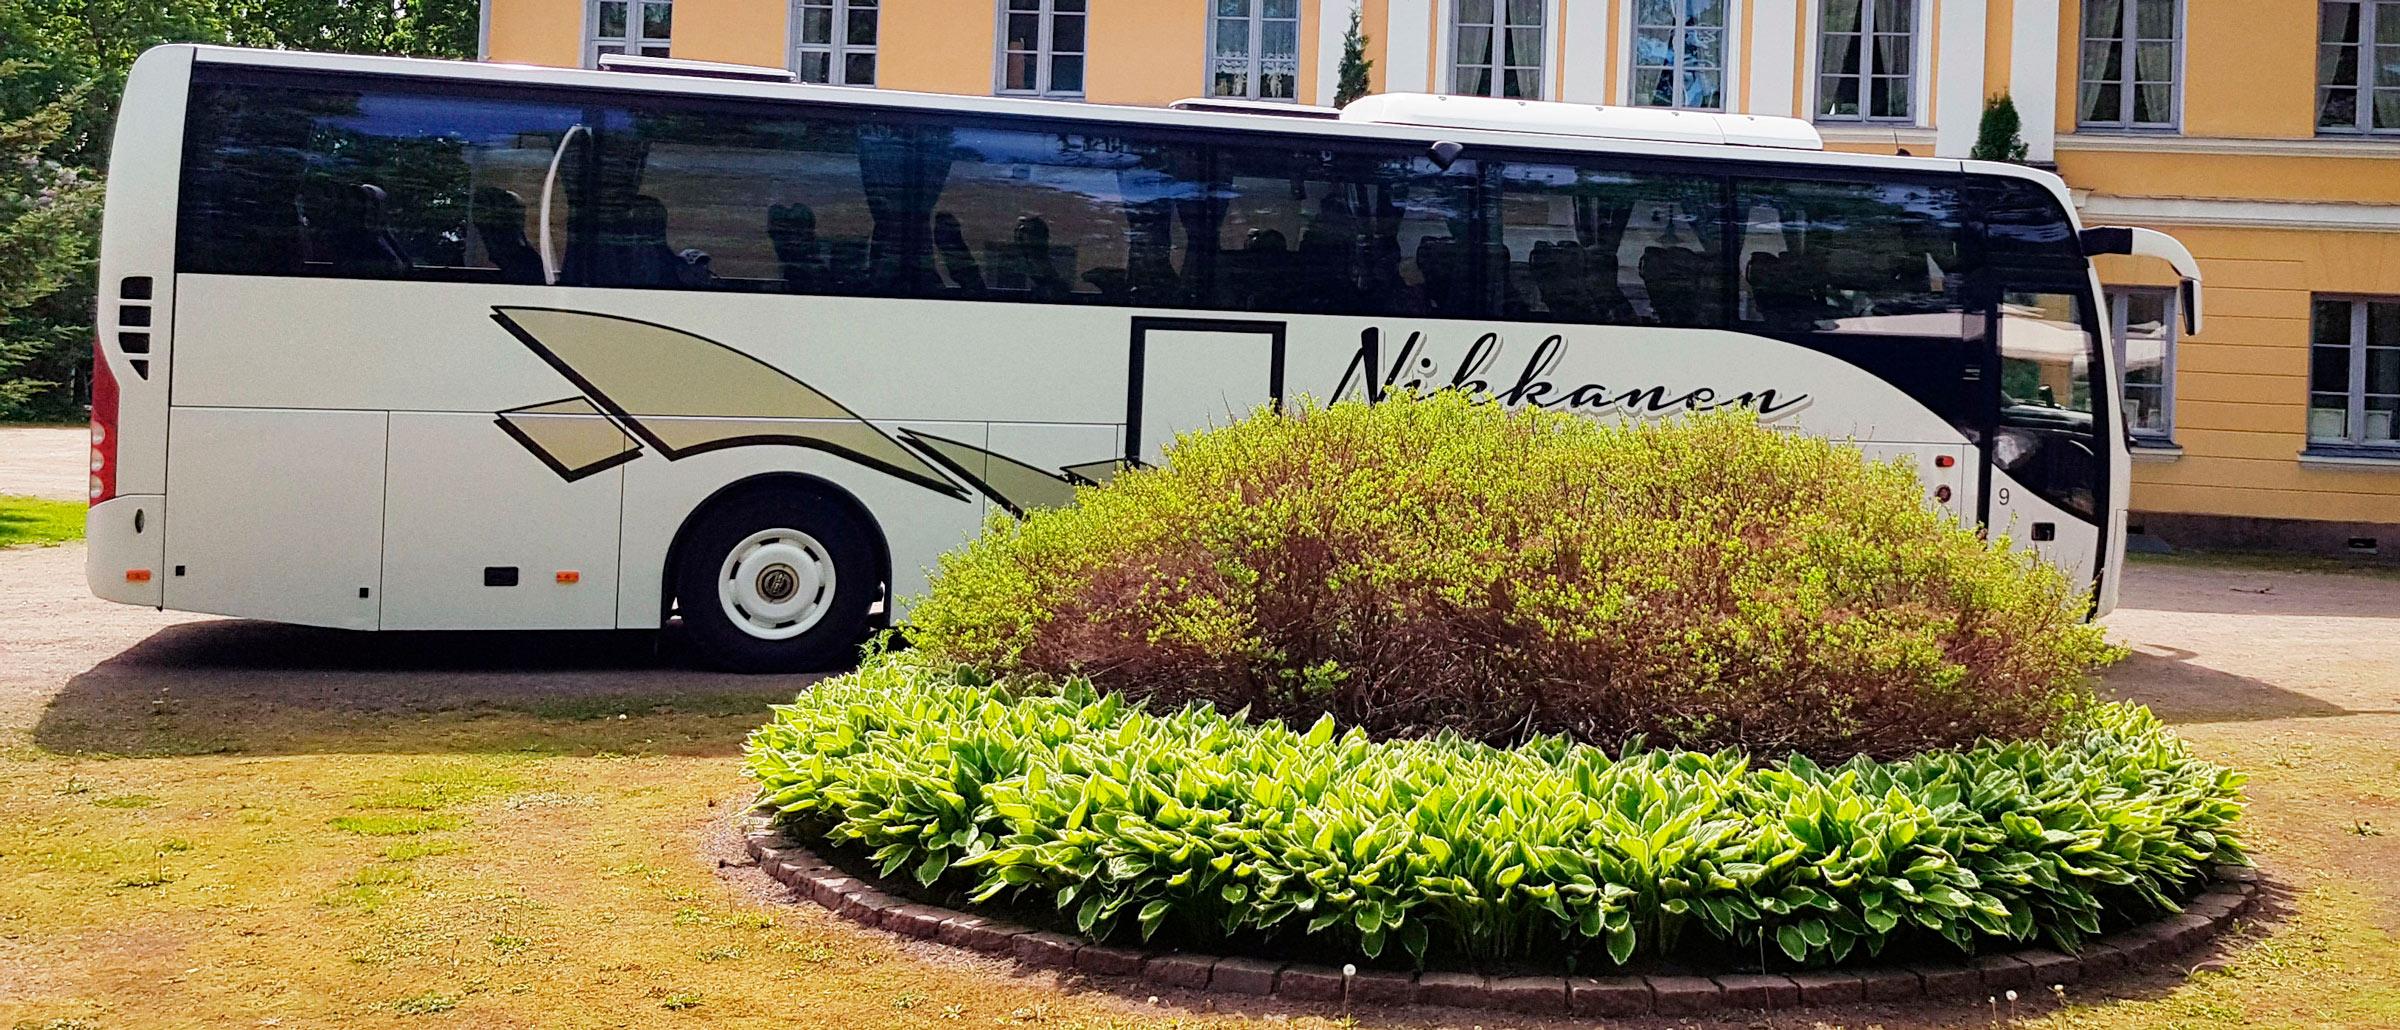 Tilausajo Nikkanen